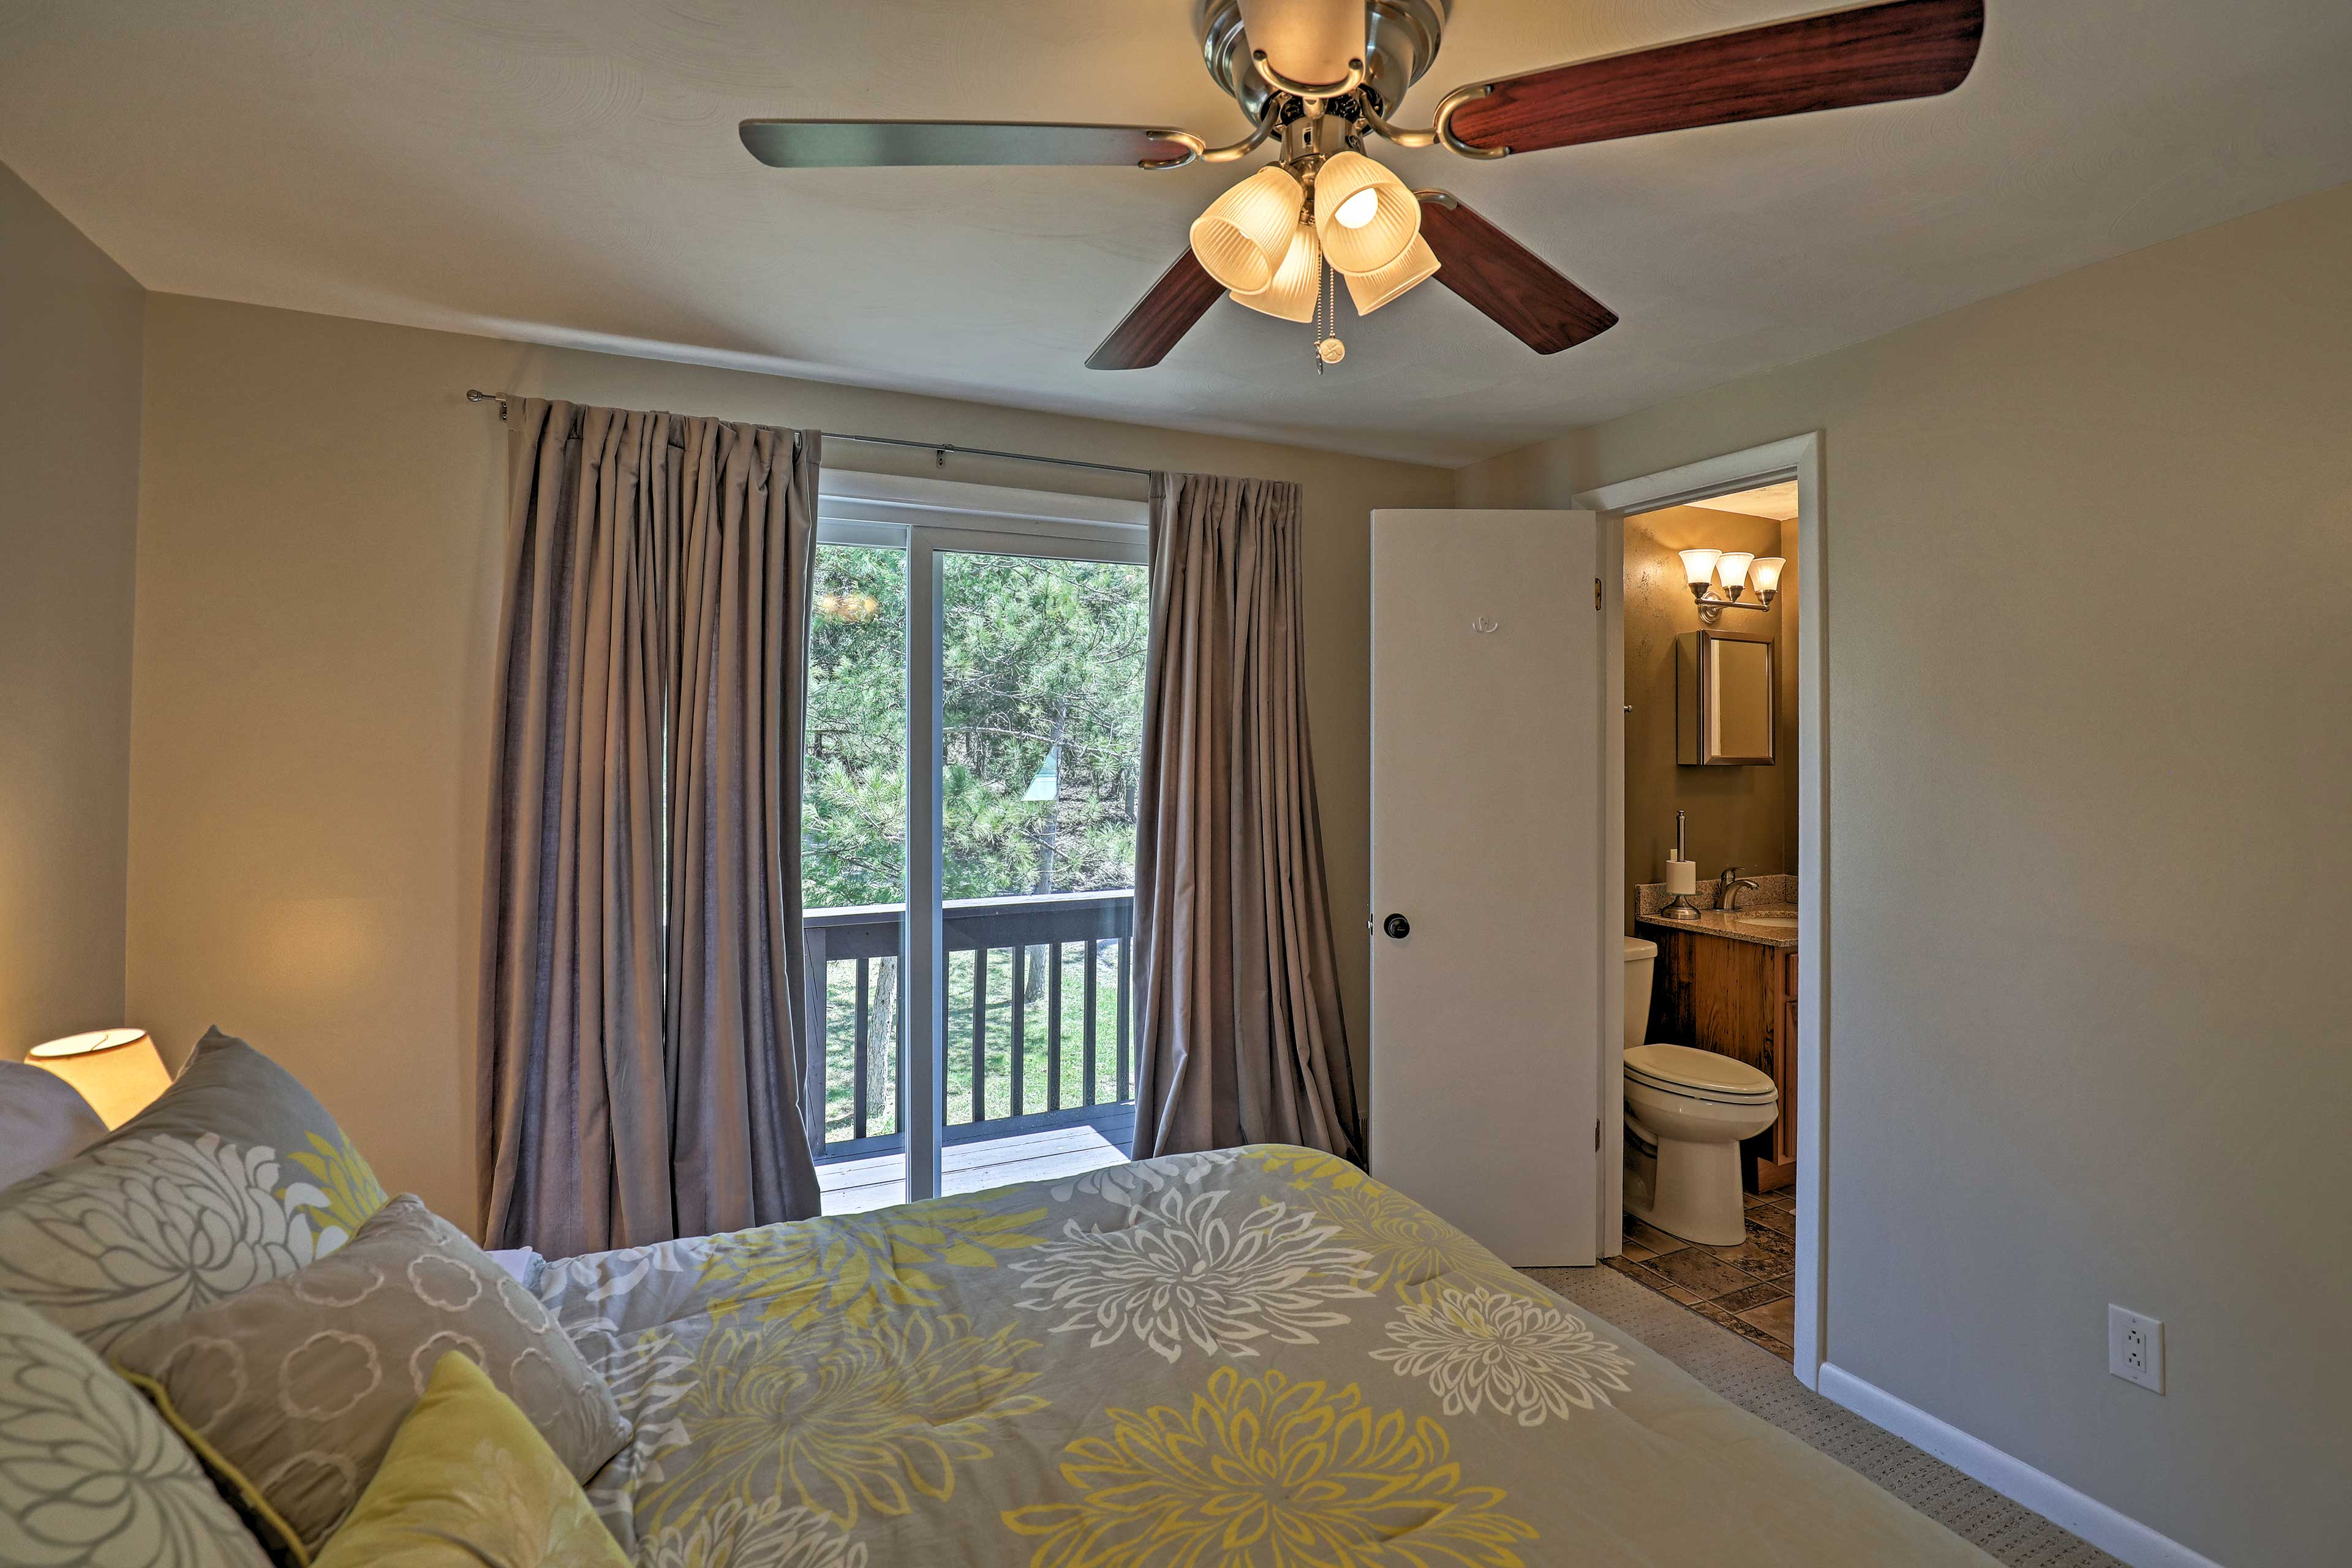 Wake to views through the sliding glass doors.